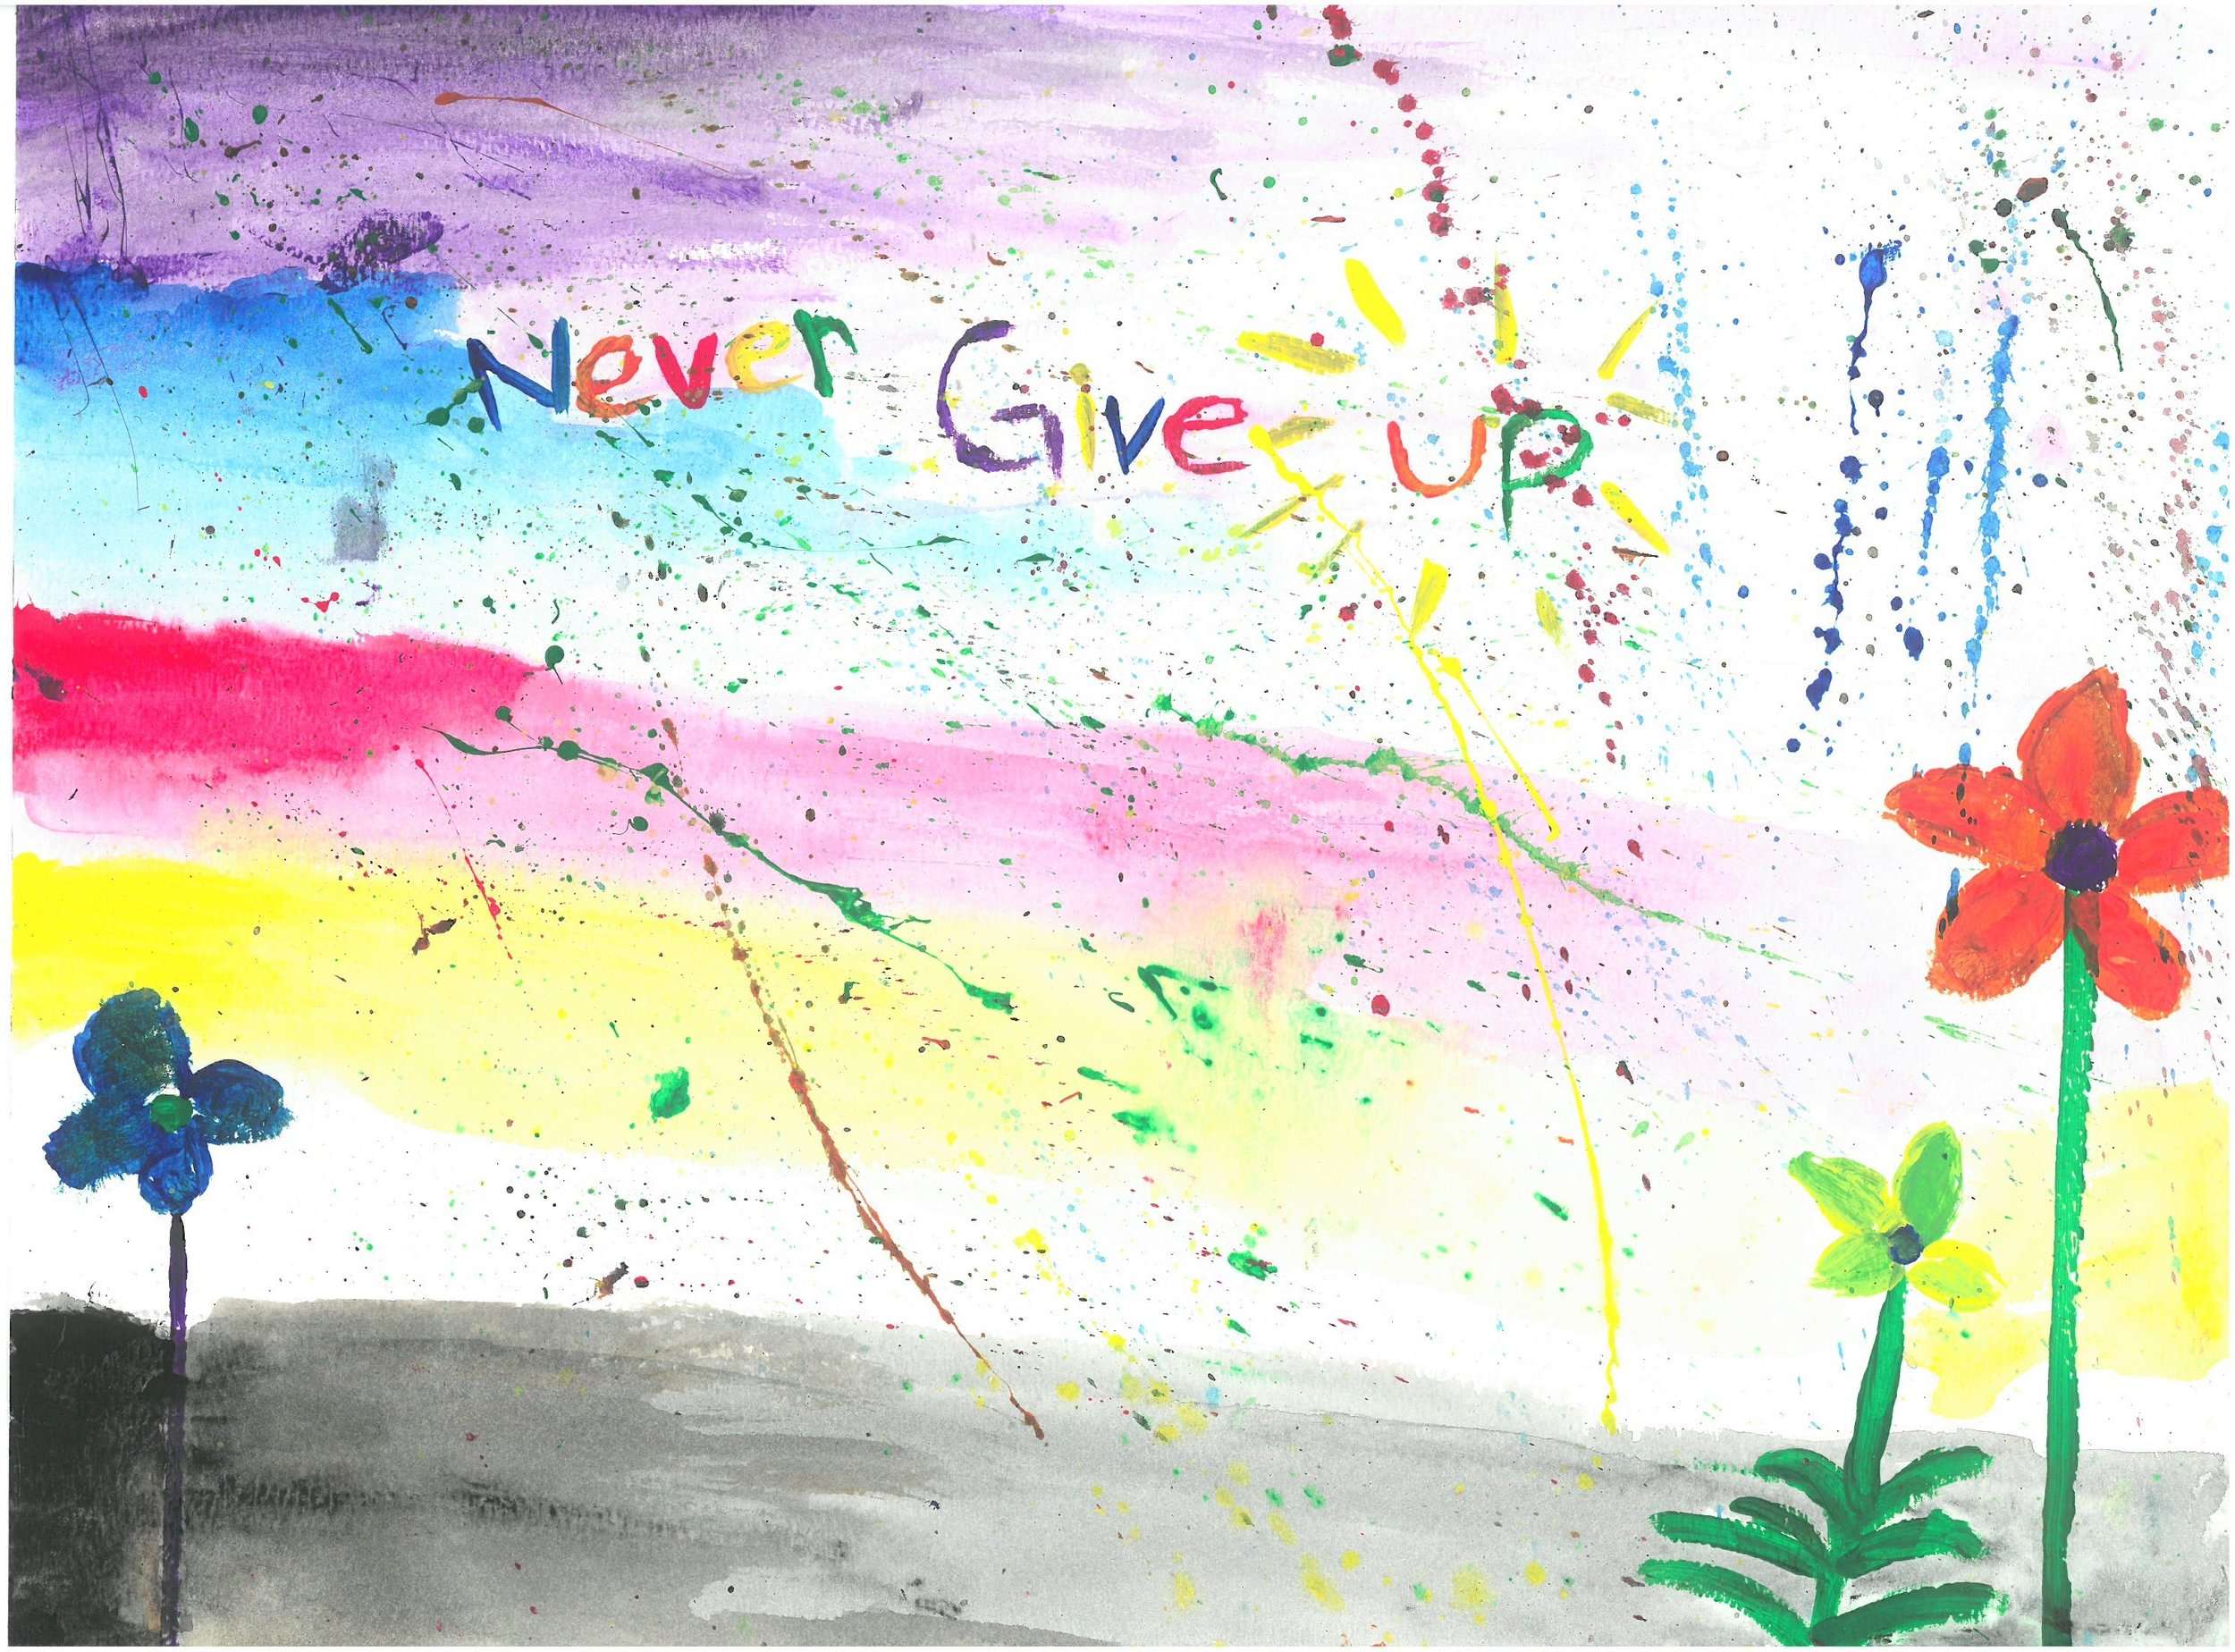 Artwork by a student at St. Nicholas Junior High, Edmonton, Alberta